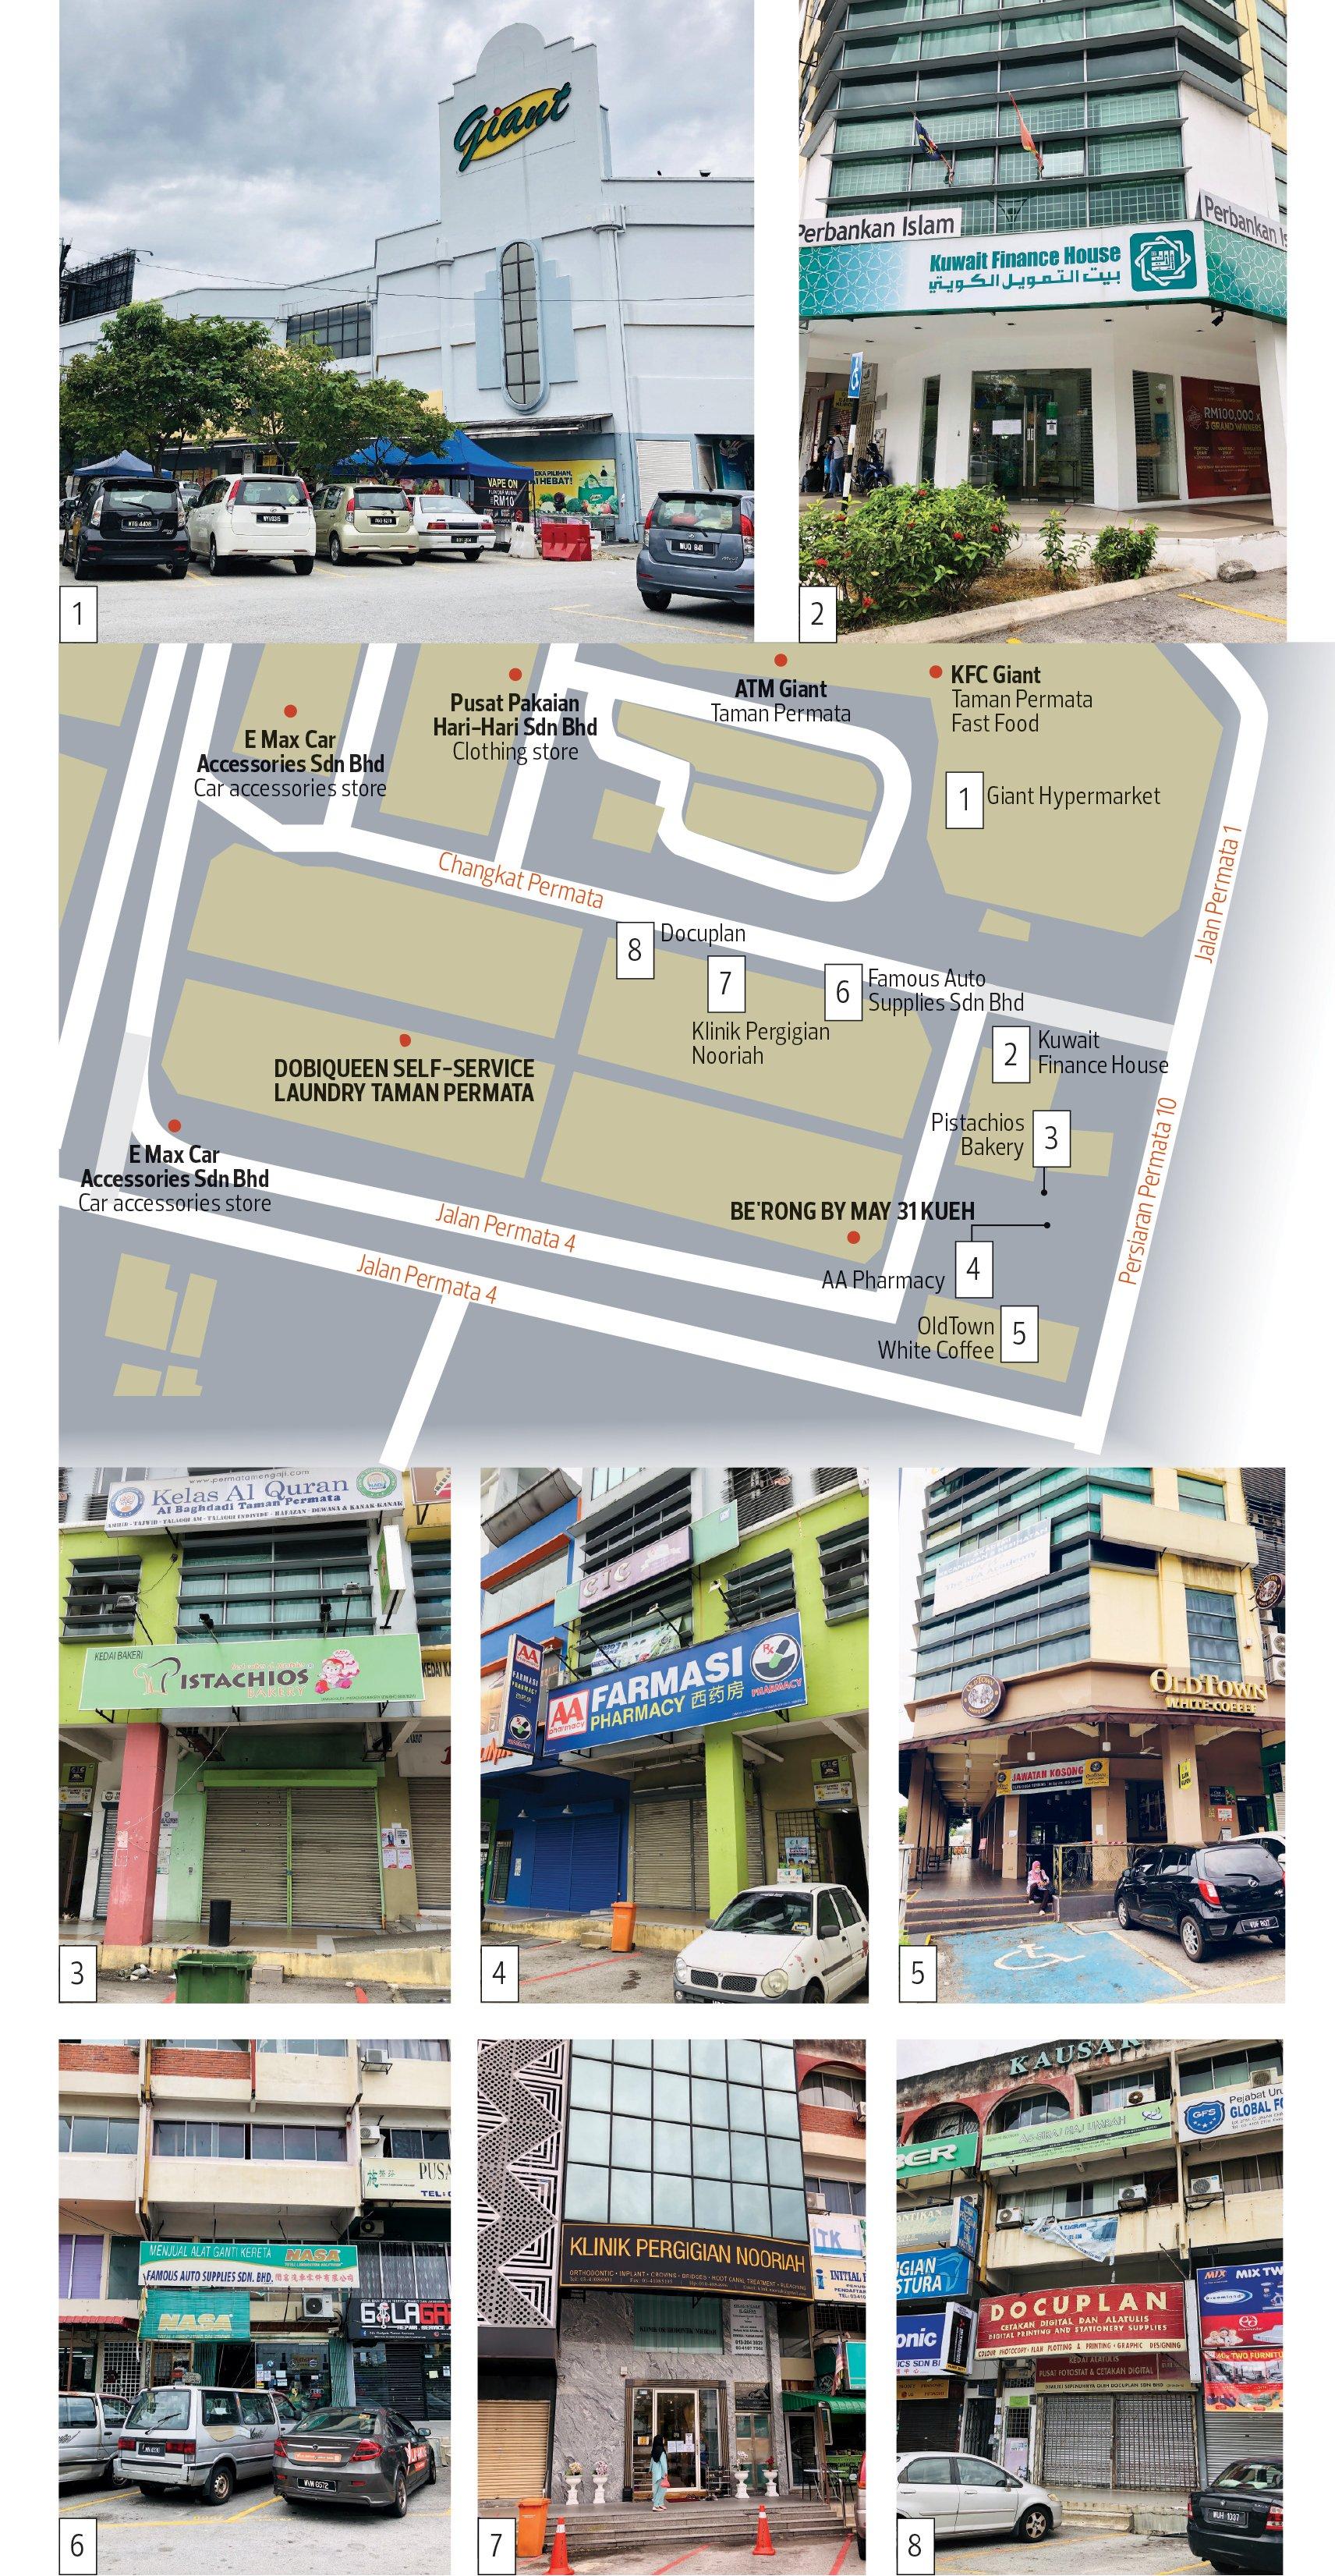 Streetscapes: Bustling Taman Permata in need of rejuvenation